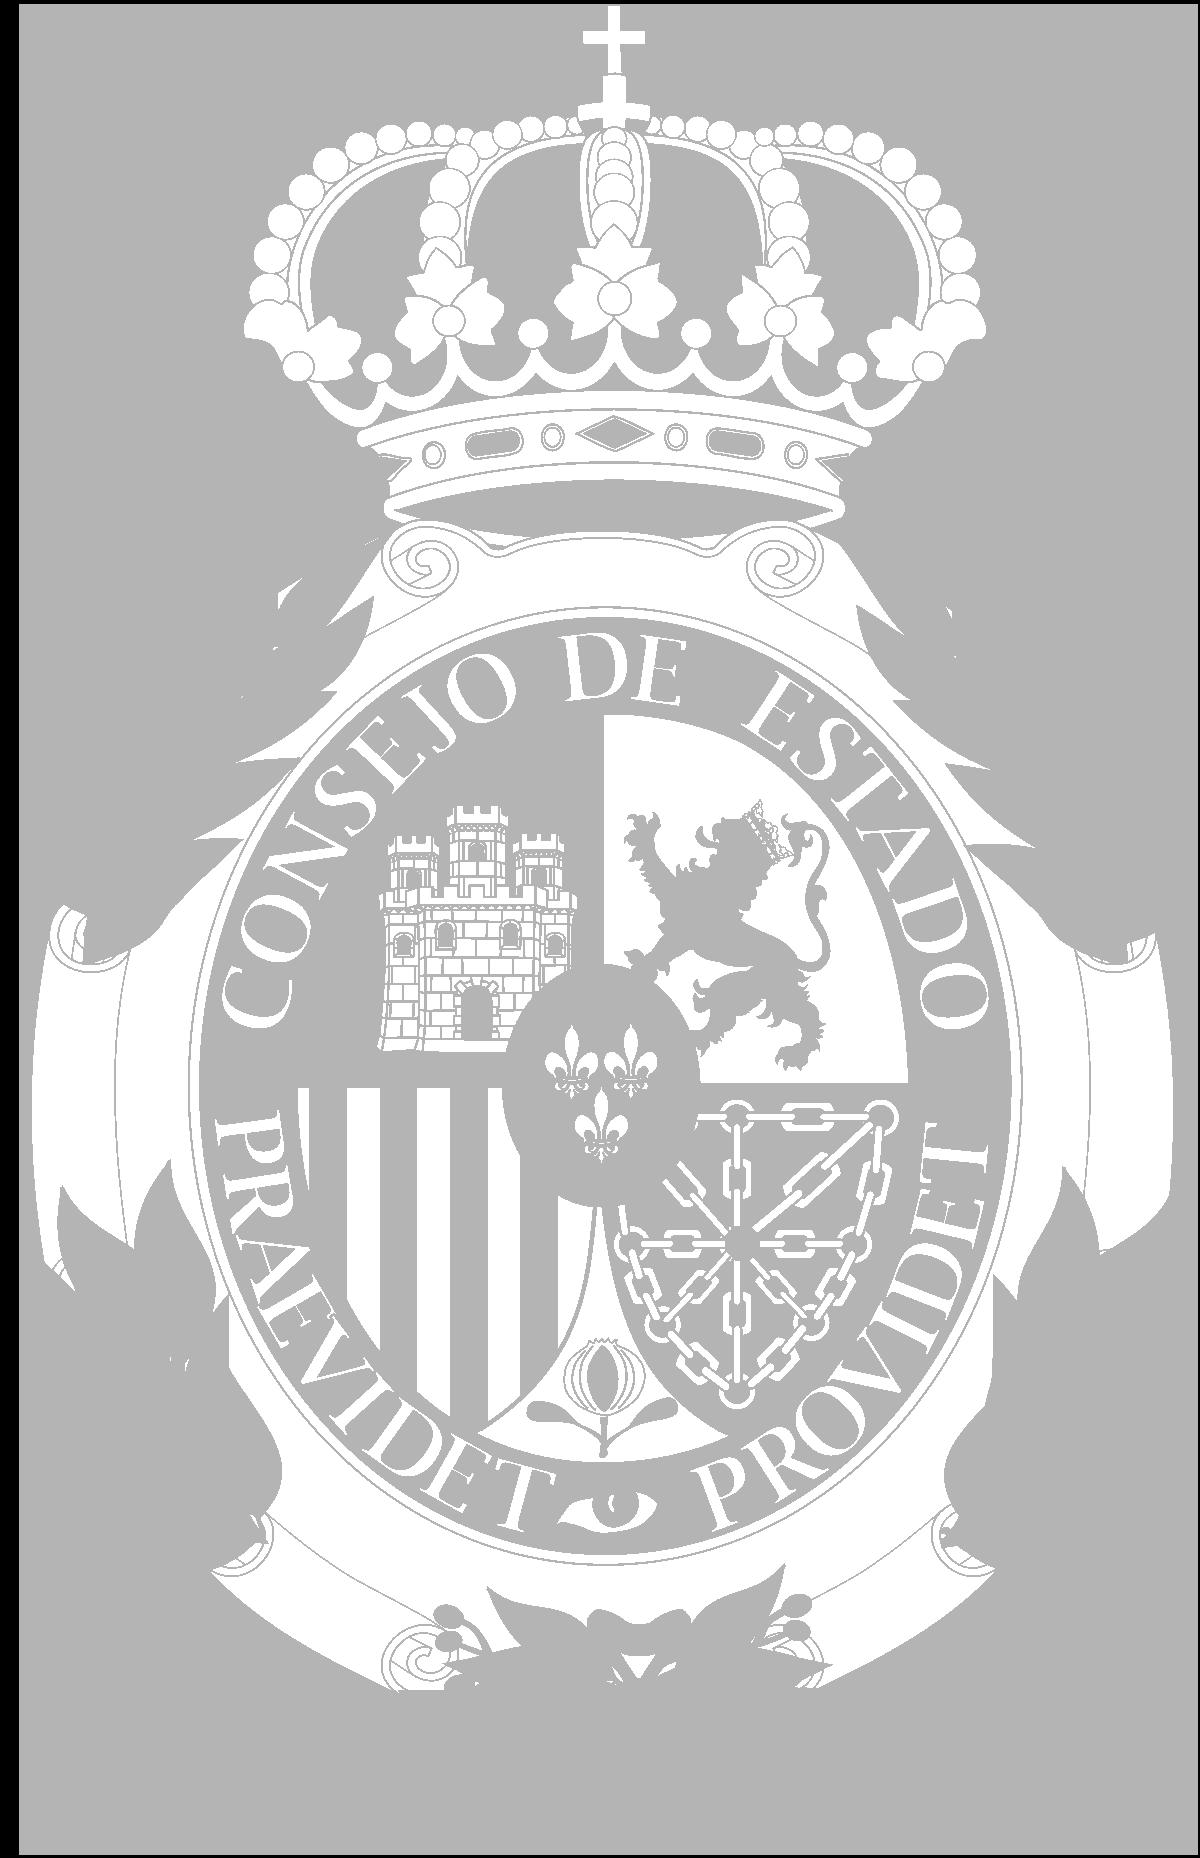 escudo Consejo de Estado